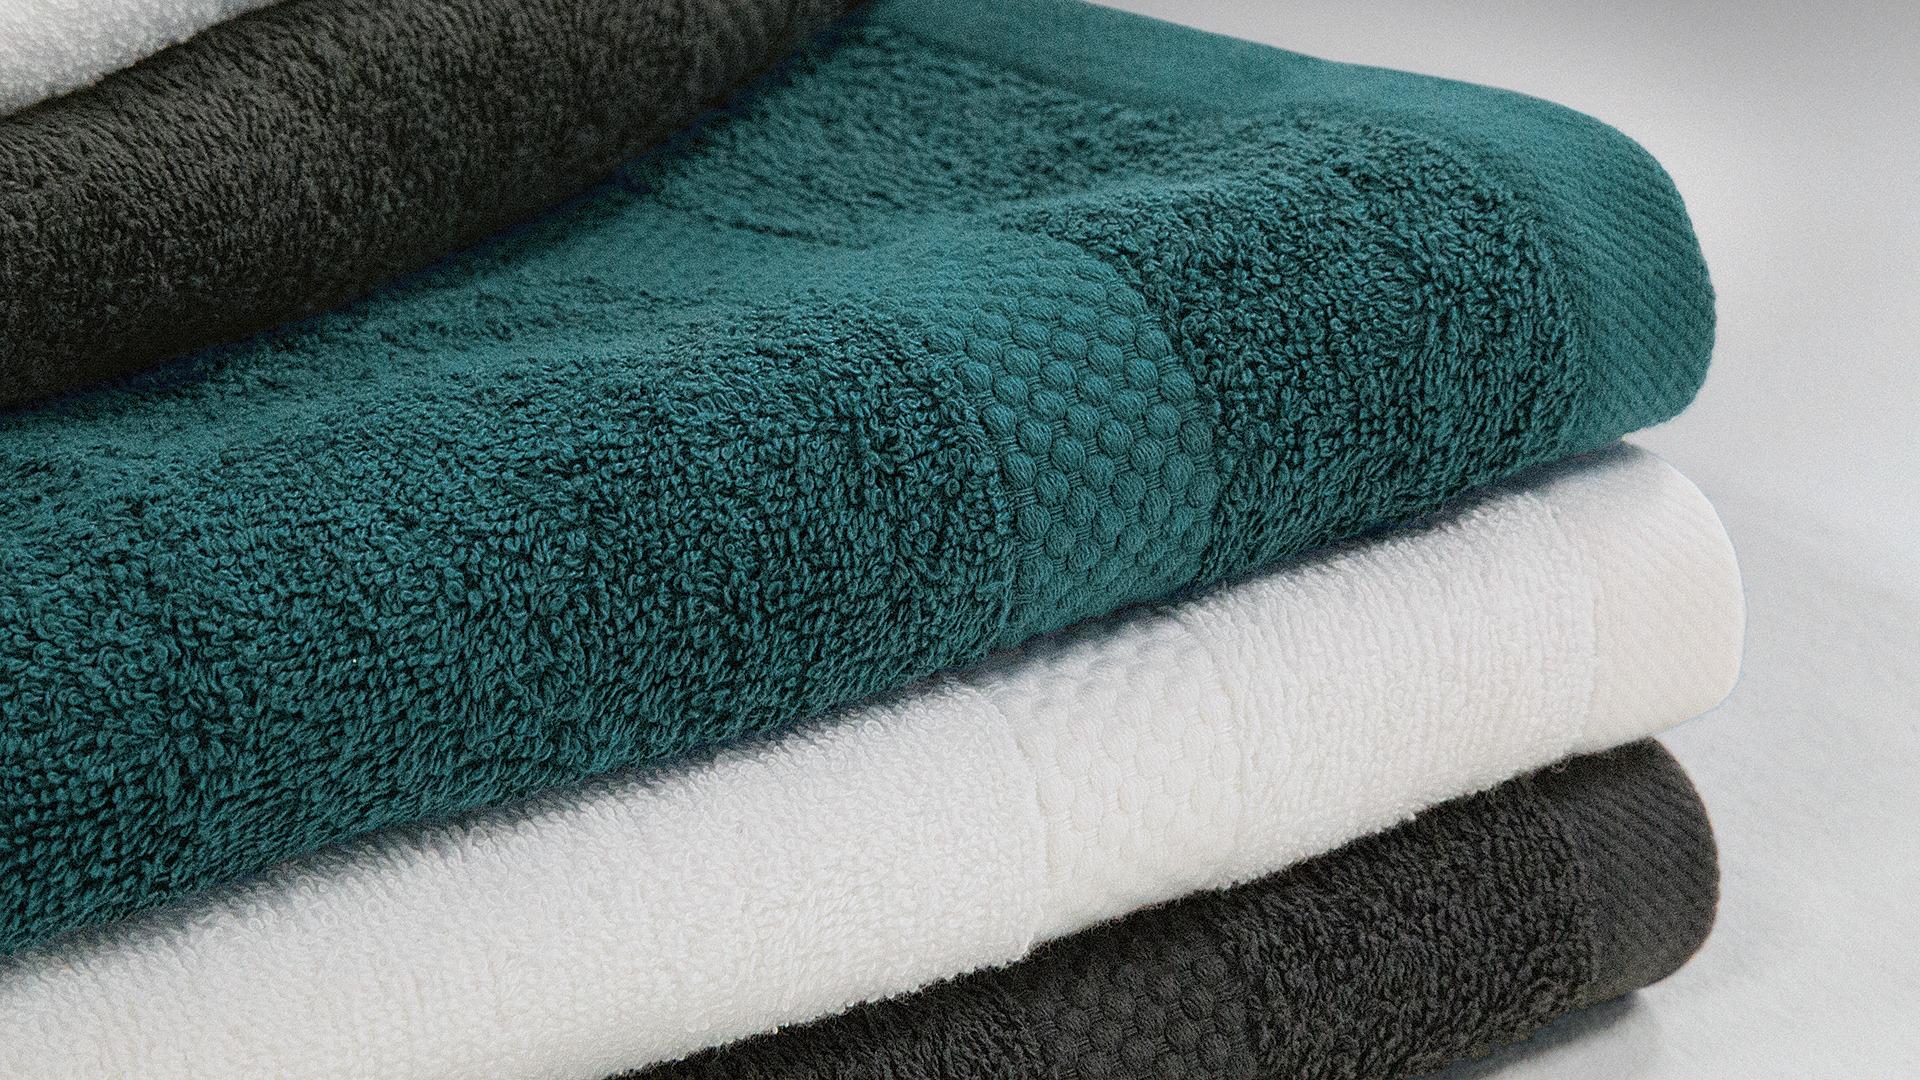 banters mikrofaser handtuch in grau f r sport und fitness. Black Bedroom Furniture Sets. Home Design Ideas